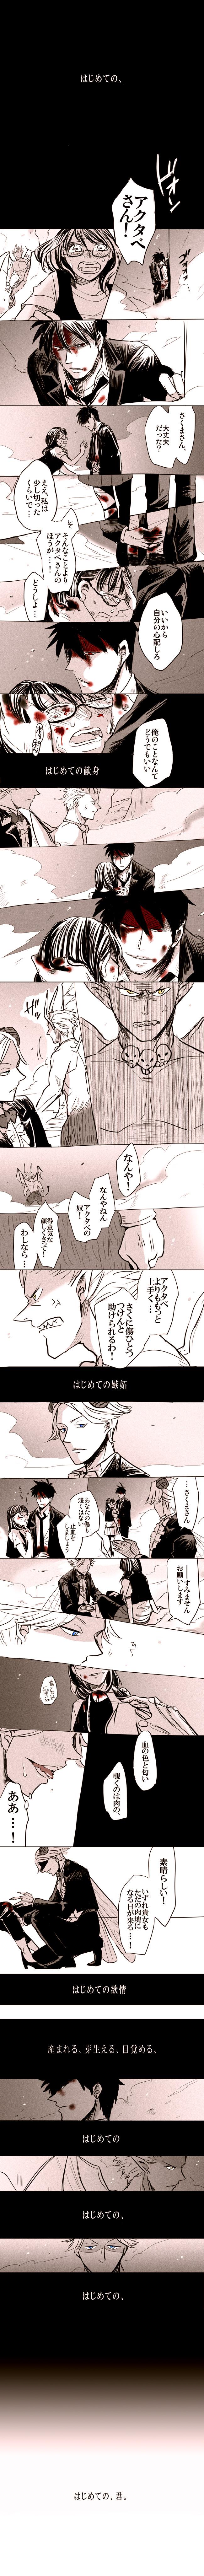 Tags: Anime, Yondemasuyo Azazel-san, Beelzebub (Yondemasuyo Azazel-san), Azazel, Sakuma Rinko, Akutabe, Llanto, Artist Request